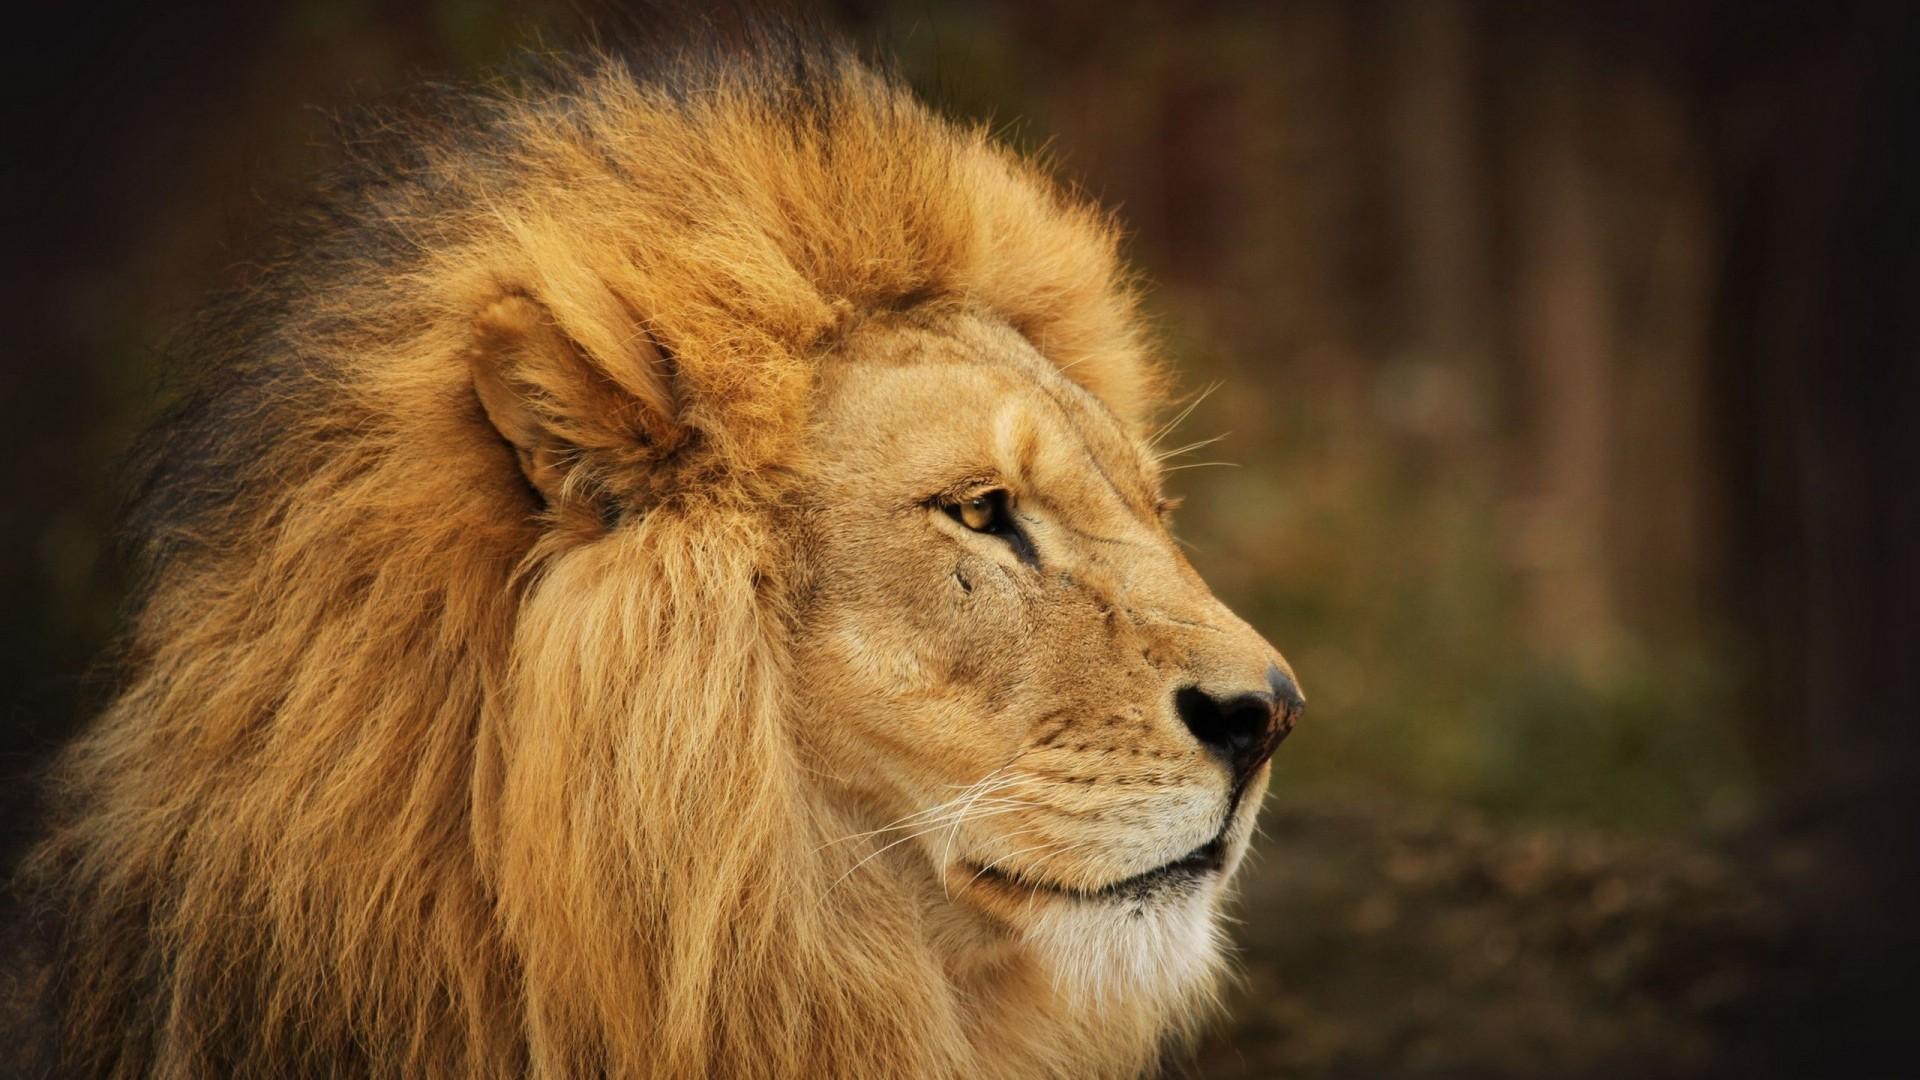 … eye; lion, face, look